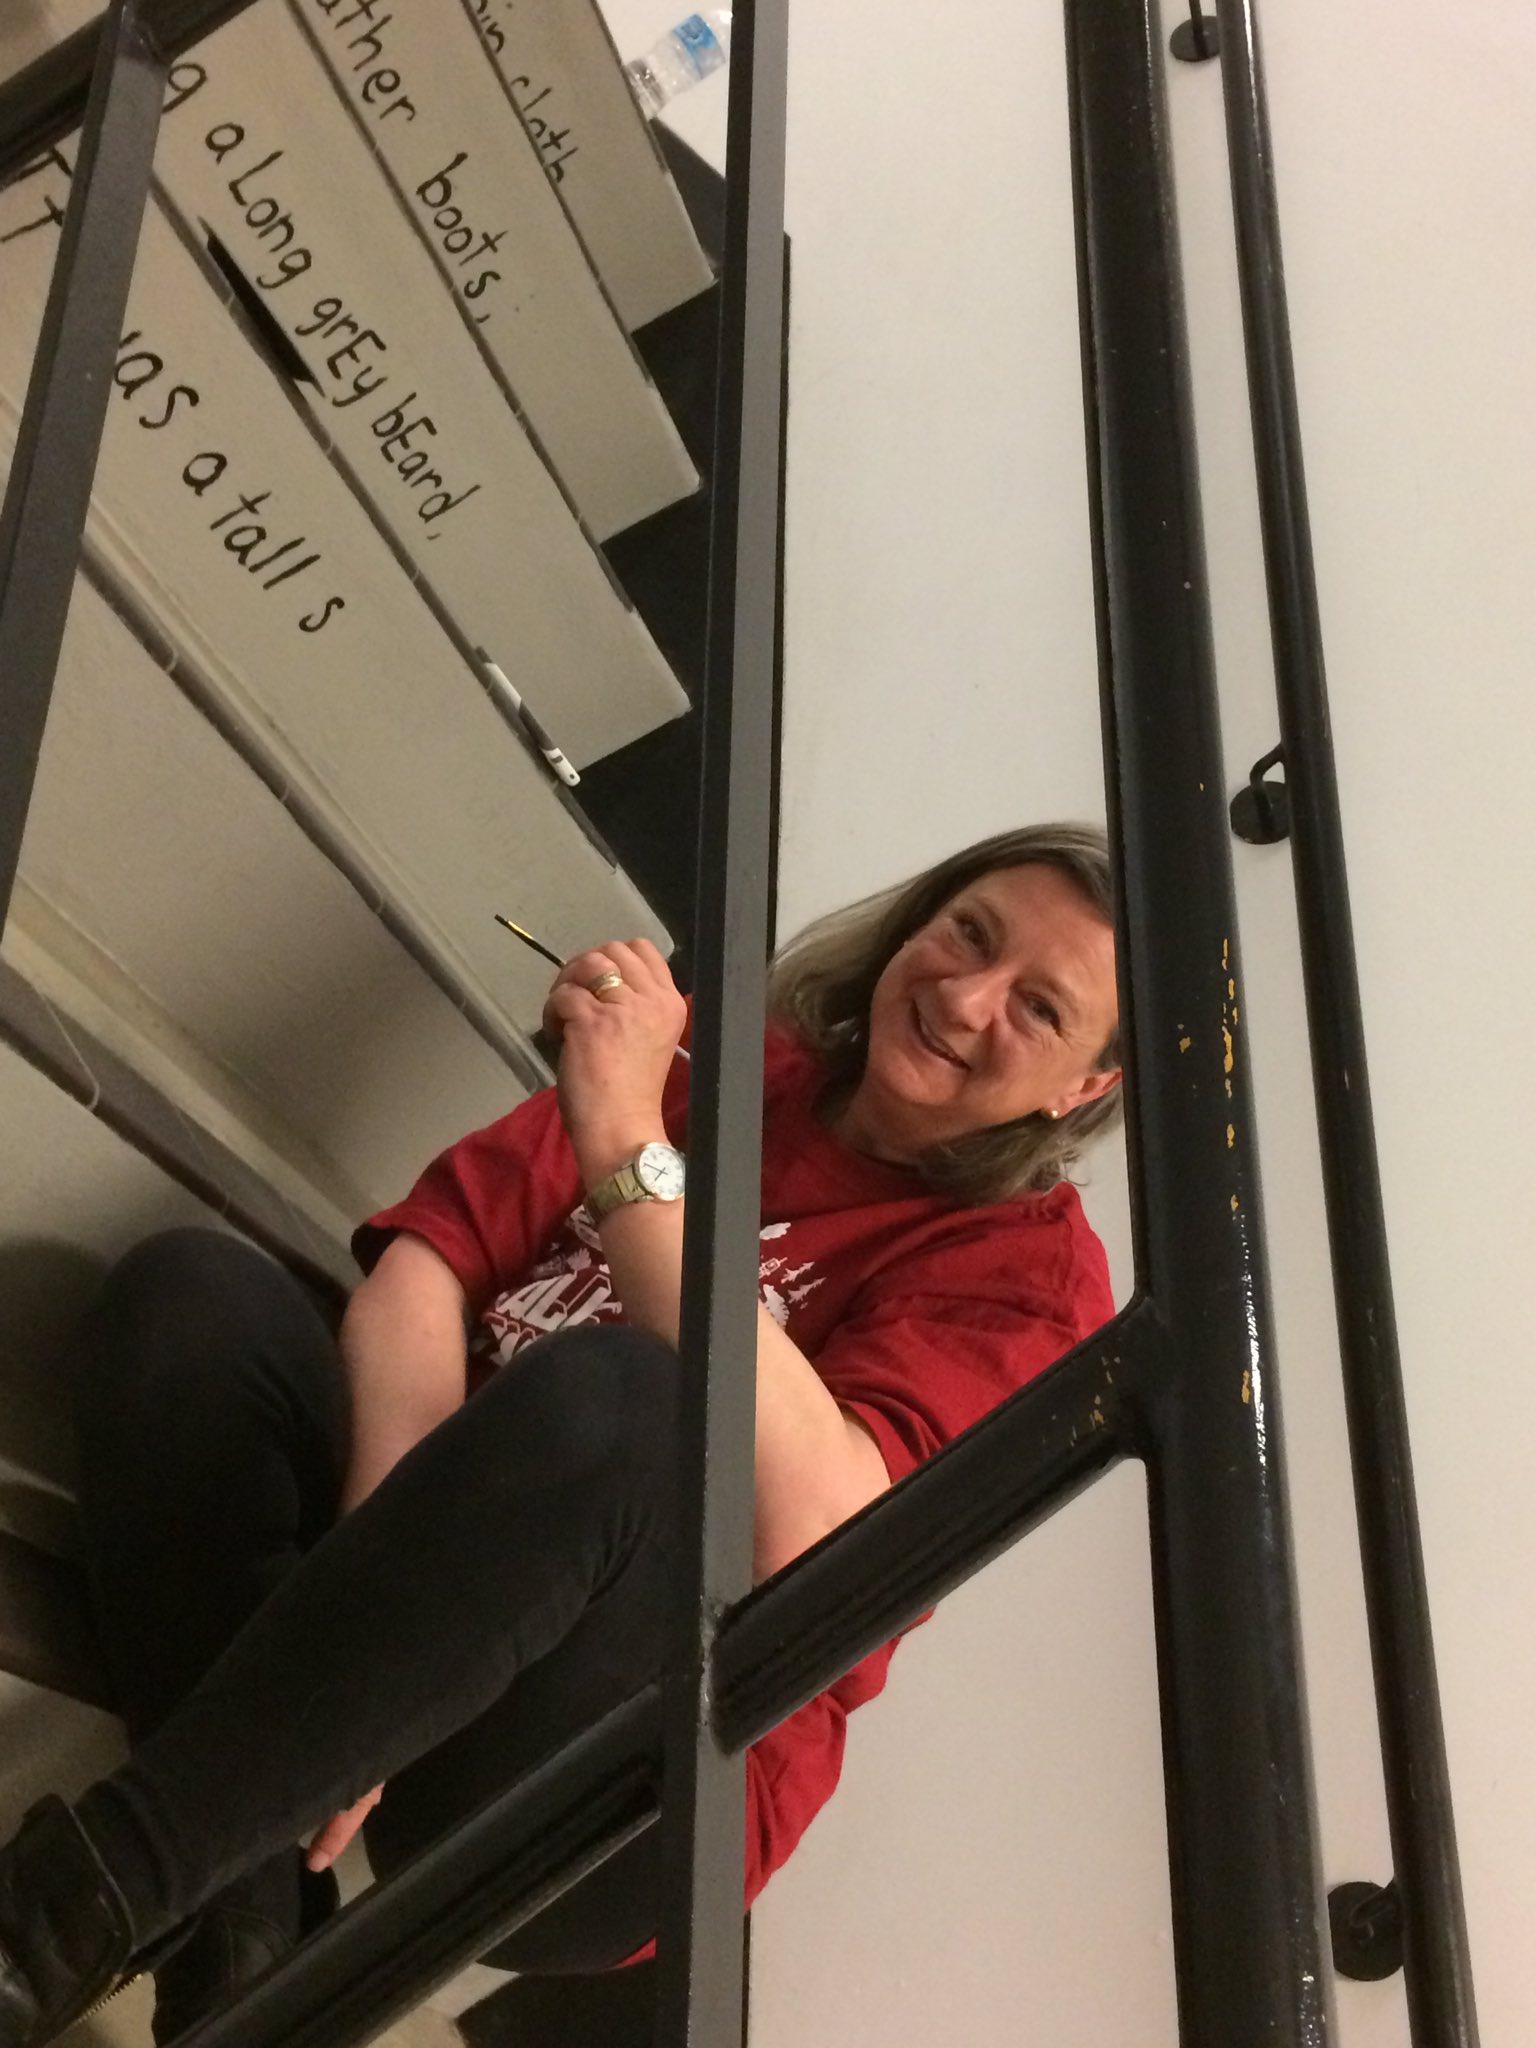 One of our distinguished alumnae @EnomisEel helps restore Leon the Frog @UCalgary_Arts. @ucalgaryalumni #LeonLives https://t.co/q0AQwNs4Uk